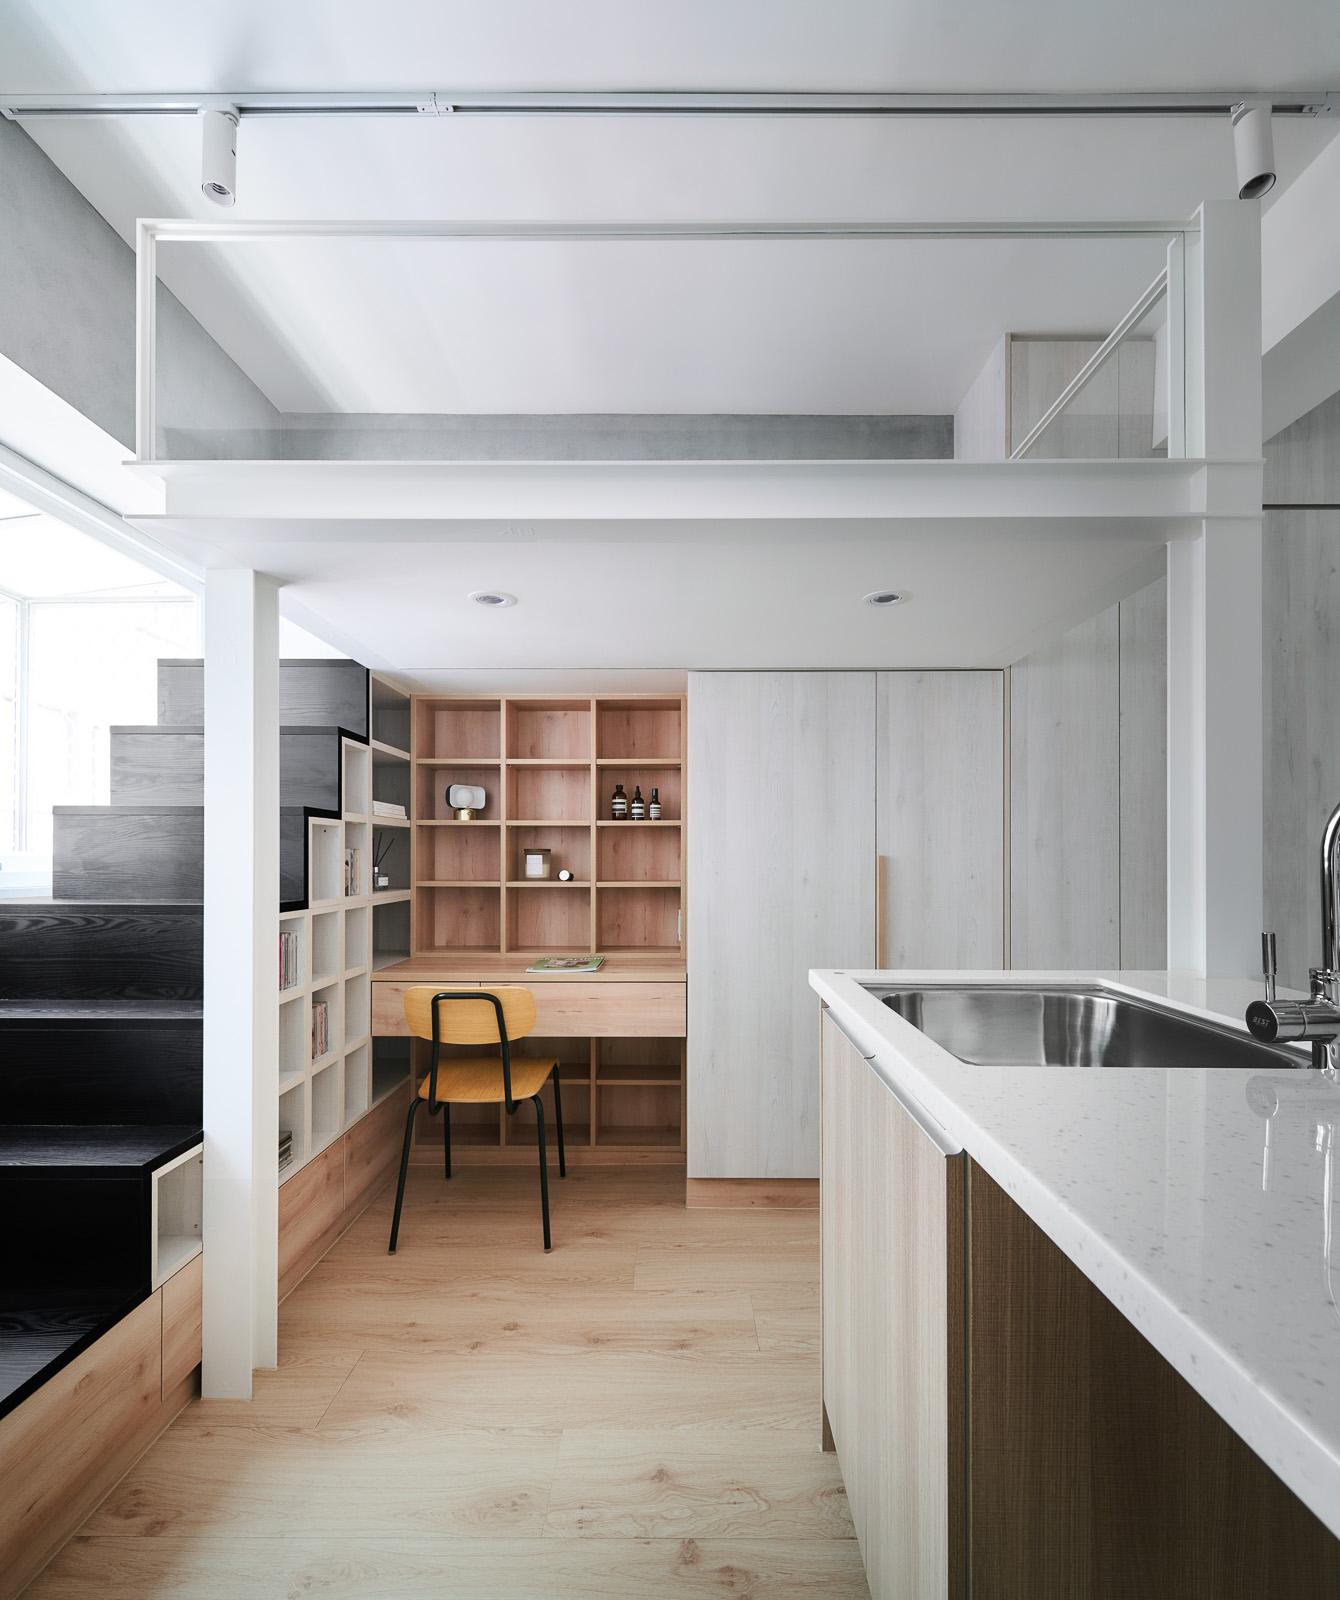 NestSpace_SmallHouse_S-101